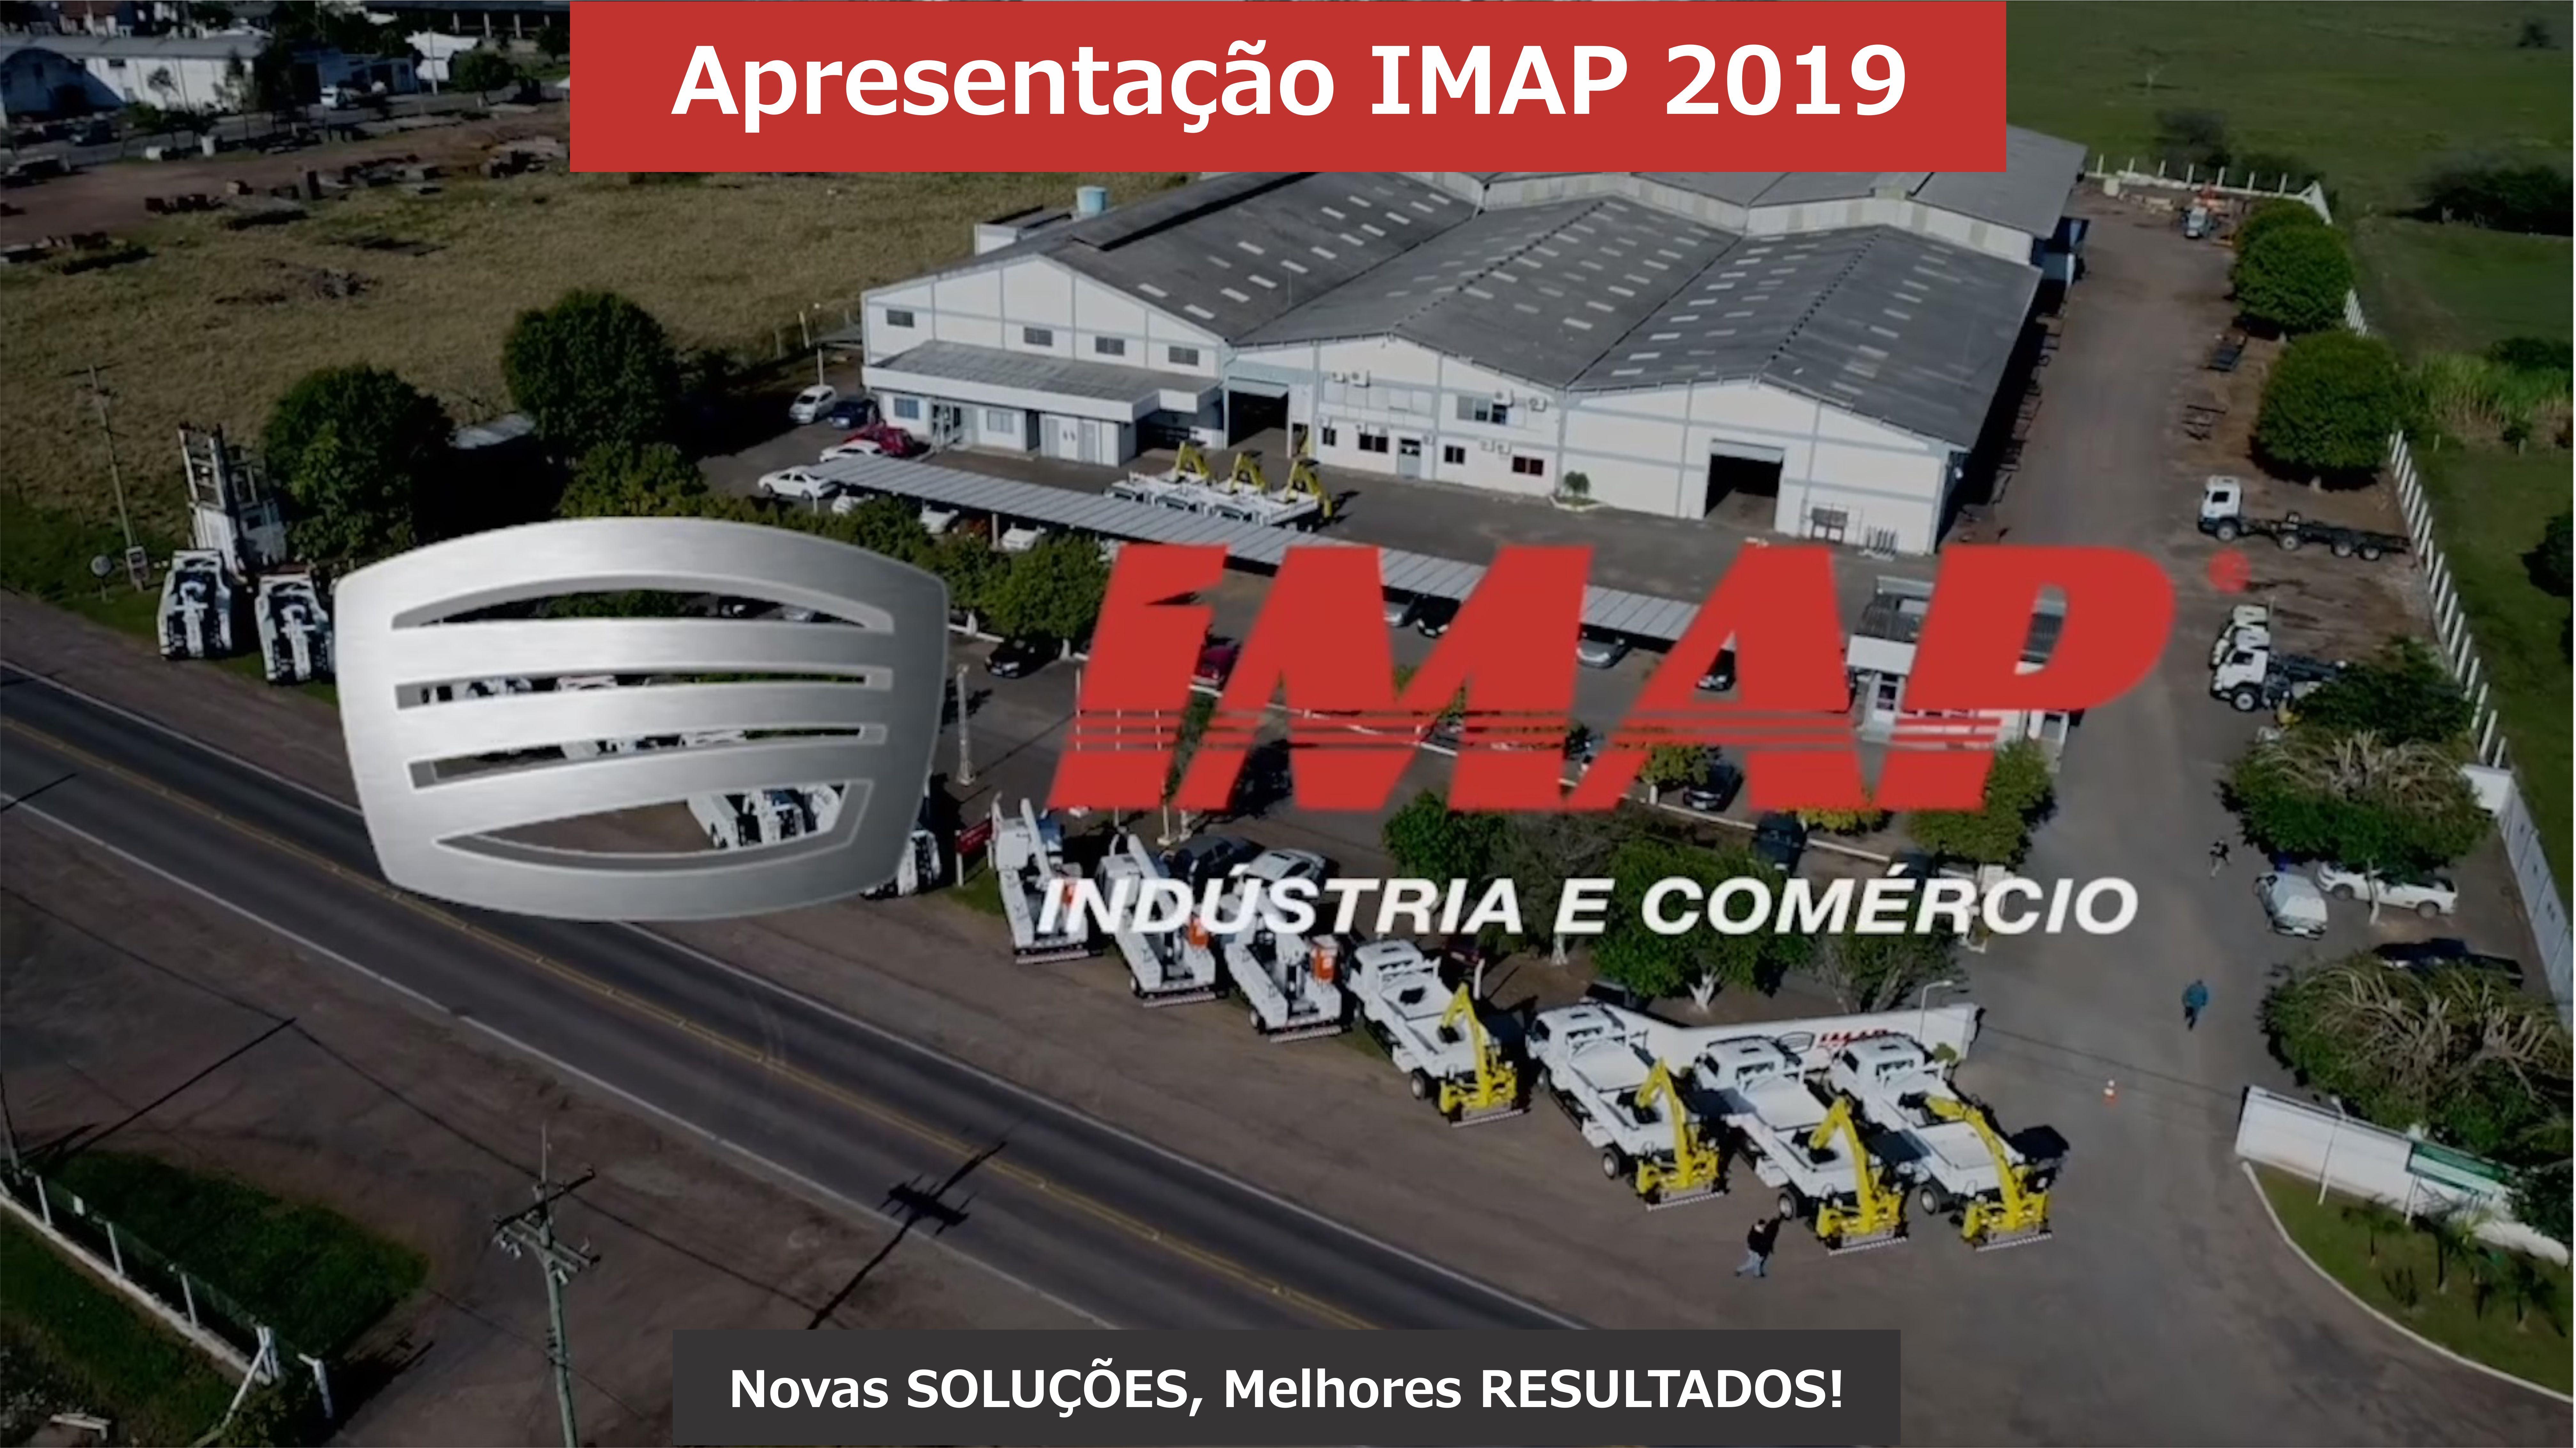 Apresentação IMAP 2019 - Apresentação IMAP 2019